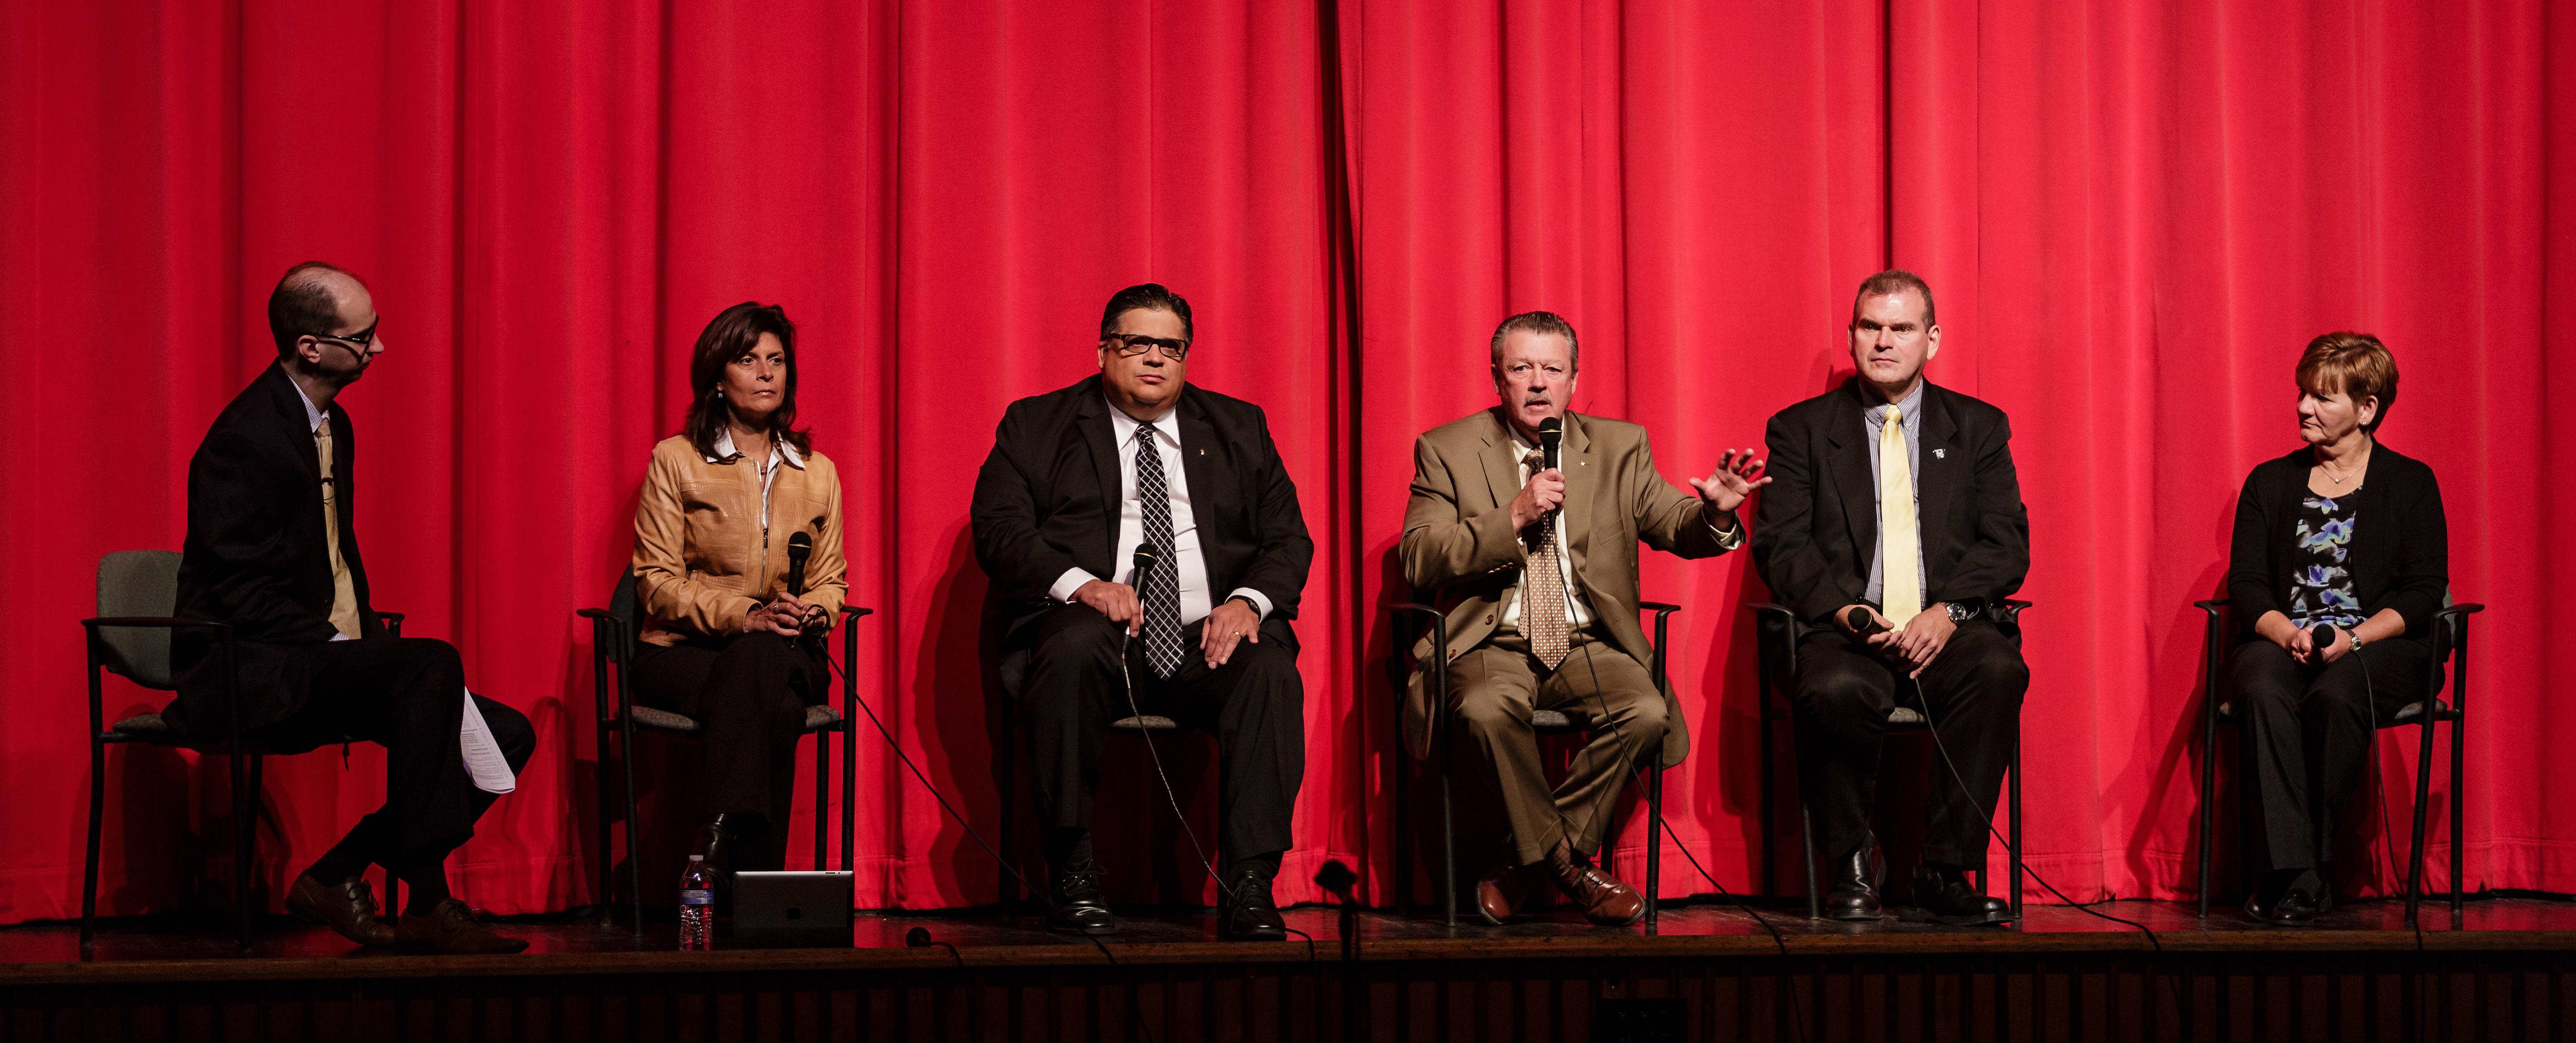 Mark Despotakis talks with McKeesport Superintendent, Dr. Rula Skezas; State Representative Marc Gergely; State Senator Jim Brewster; PMEA President, Dennis Emert; and McKeesport High School Band Director, Karen Cole.